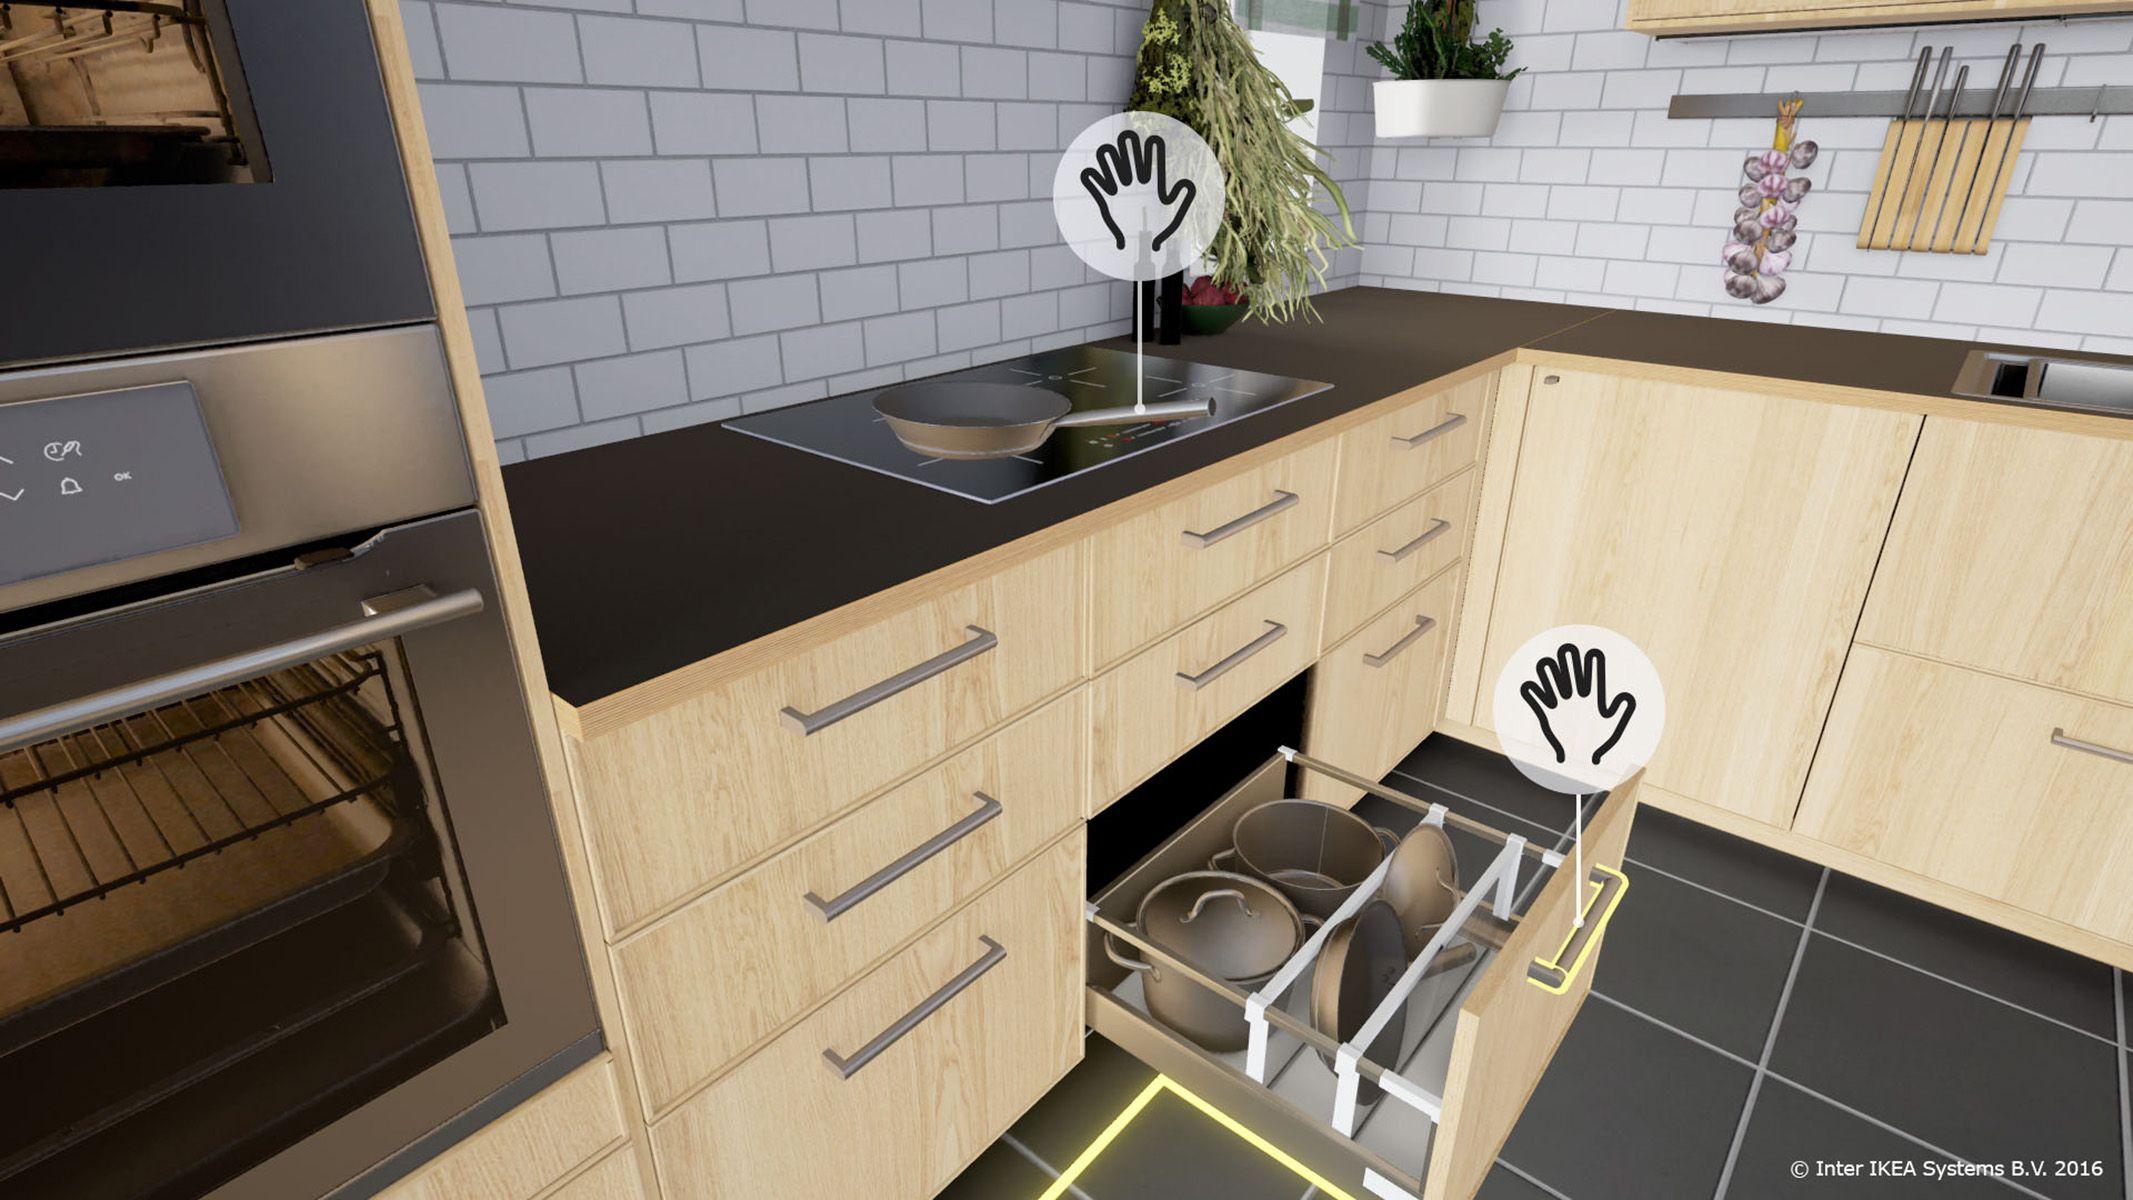 3D #ikea #realidad_Virtual Ikea Presenta App De Realidad Virtual Interesting Kitchen Design Software Ikea Review